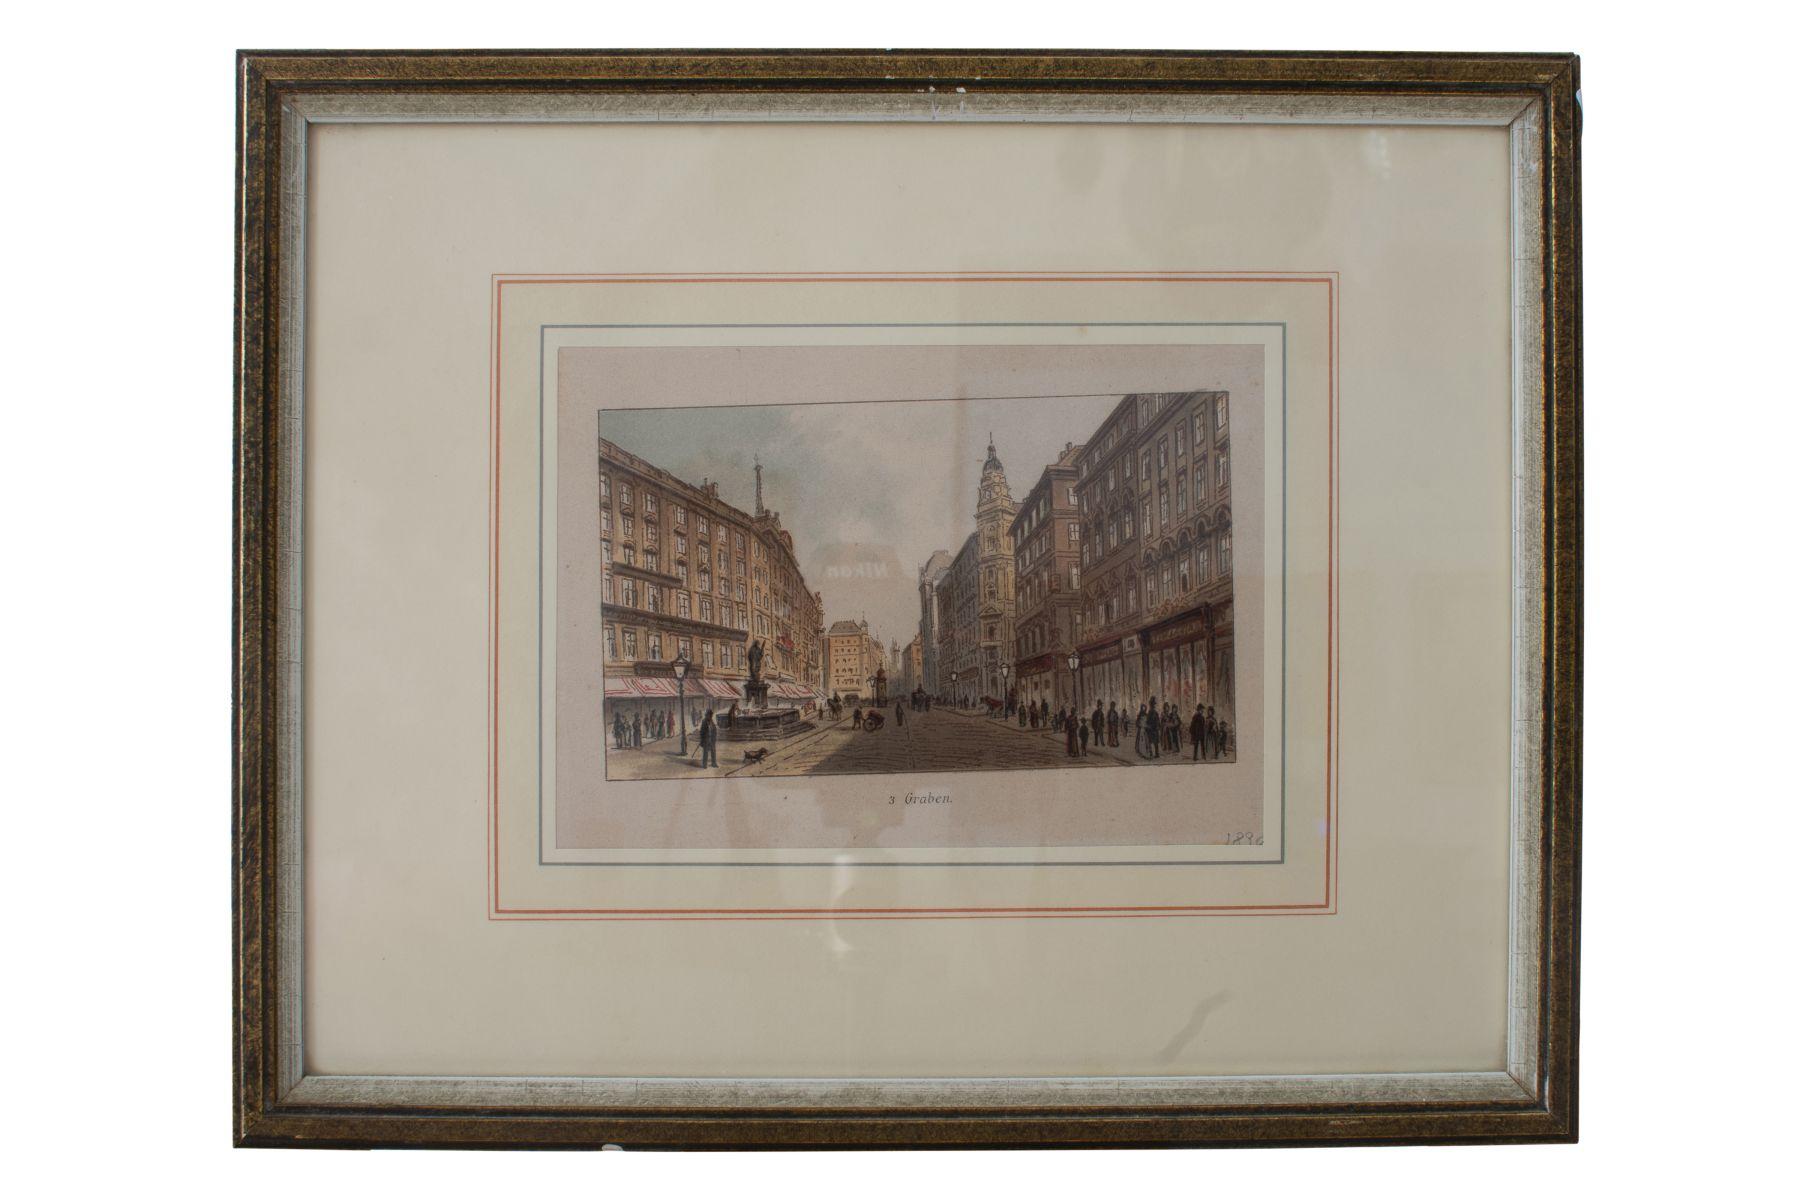 "#76 Johann Varrone (1832-1910) and Eugen Ladislaus Petrovits (1839-1907) ""Graben"" | Johann Varrone (1832-1910) und Eugen Ladislaus Petrovits (1839-1907) ""Graben"" Image"